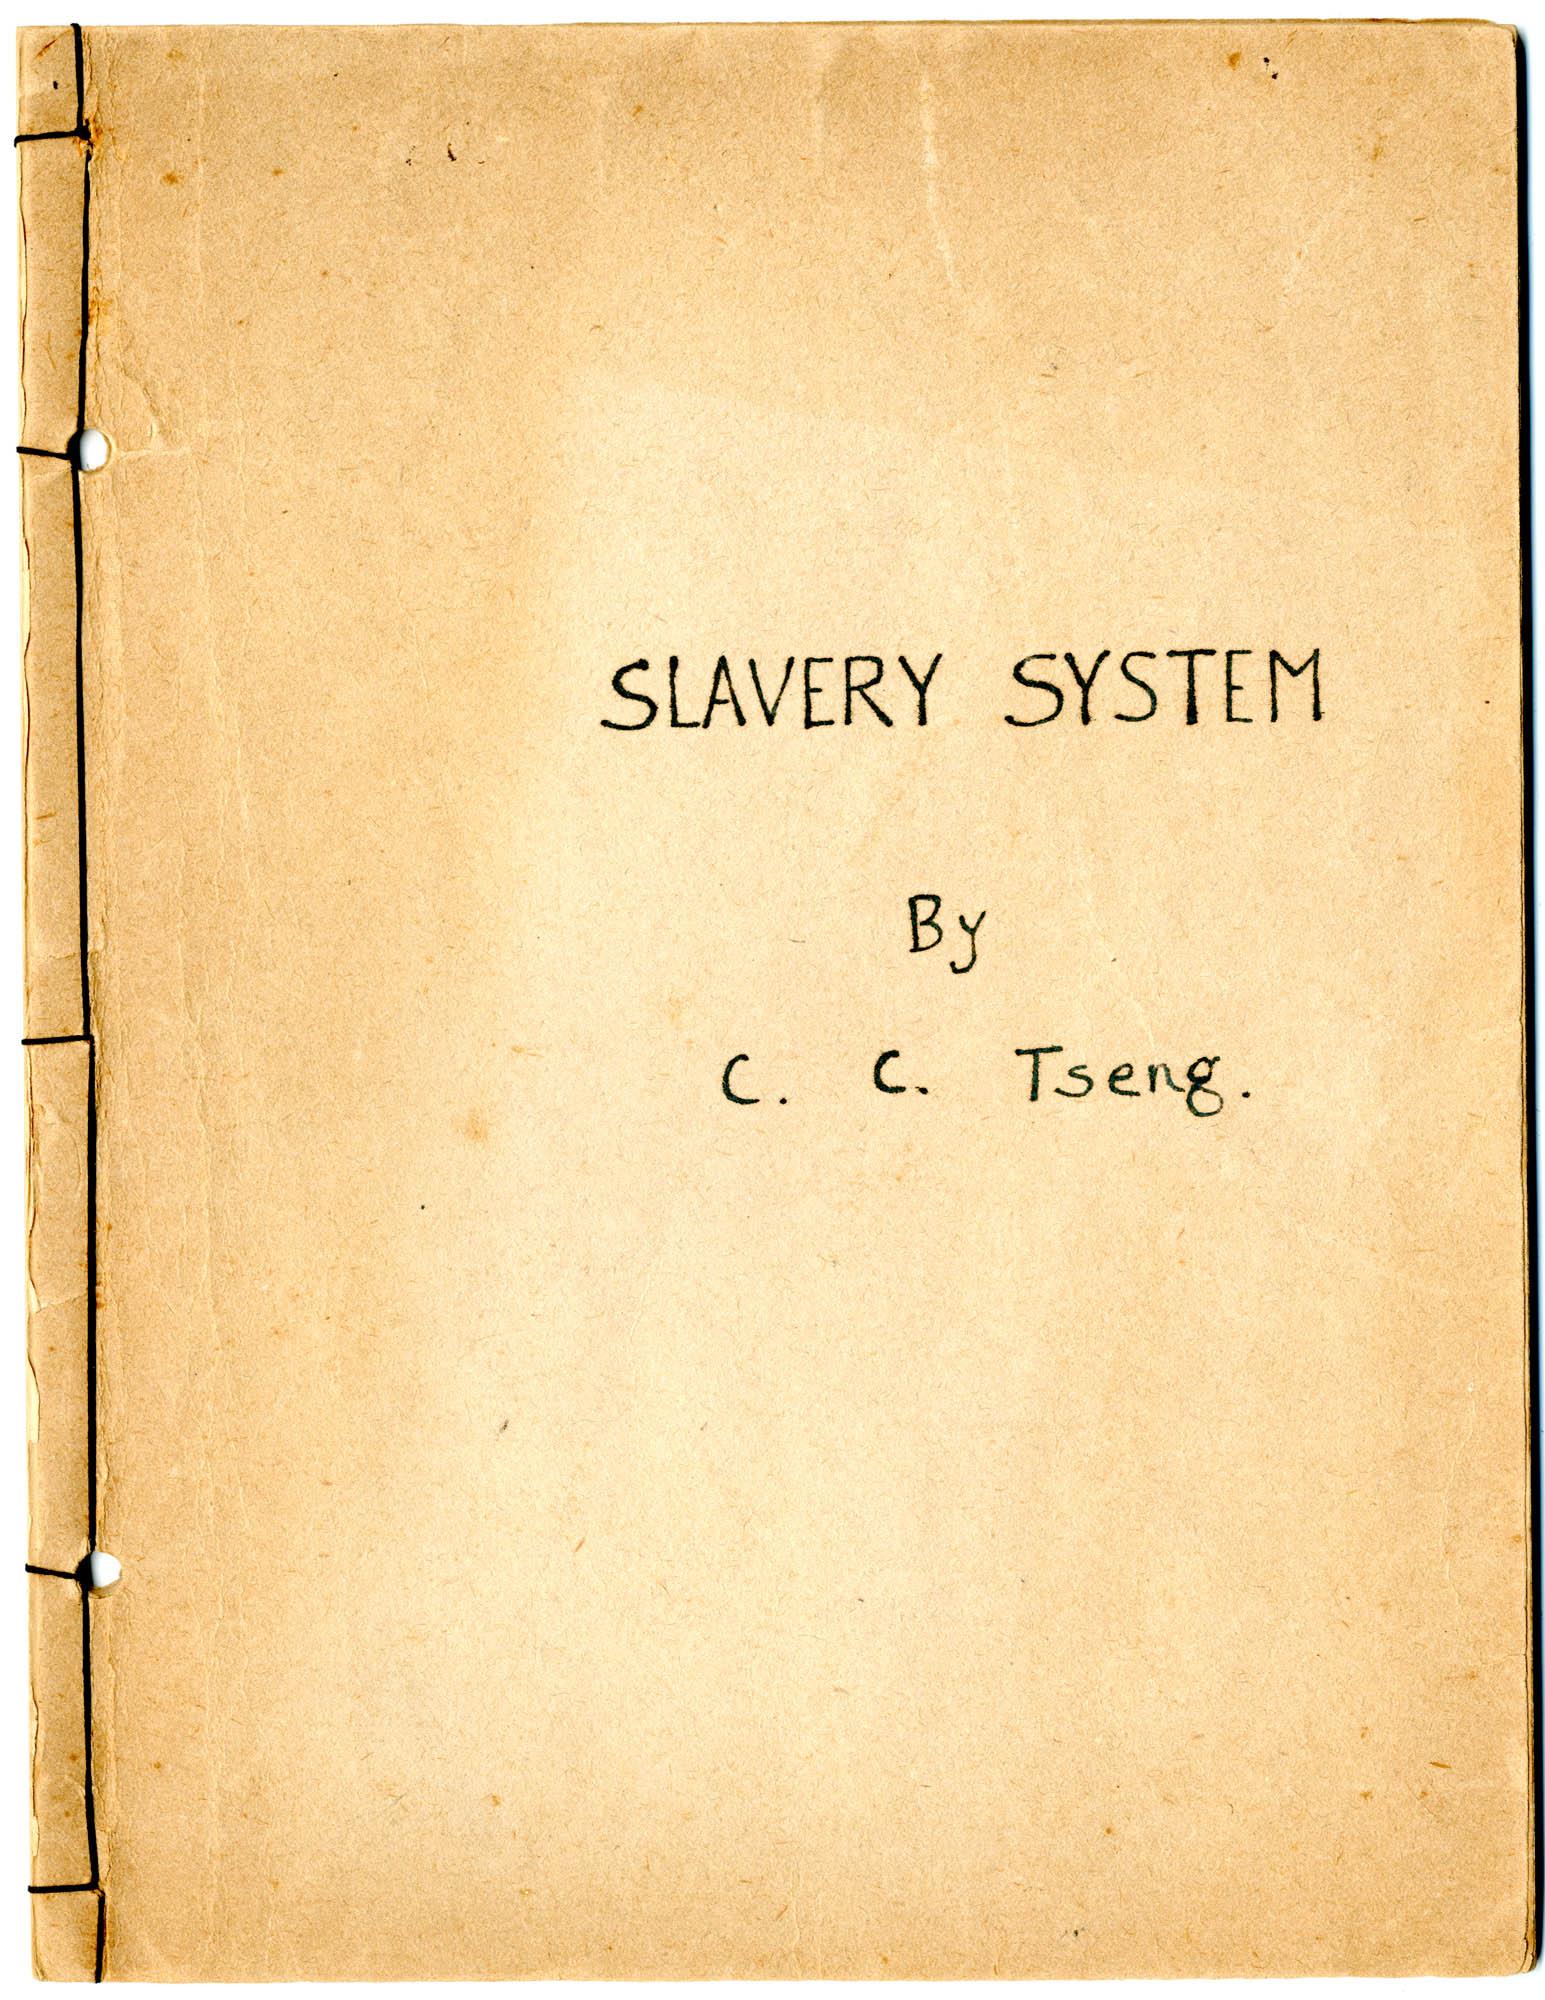 Slavery System